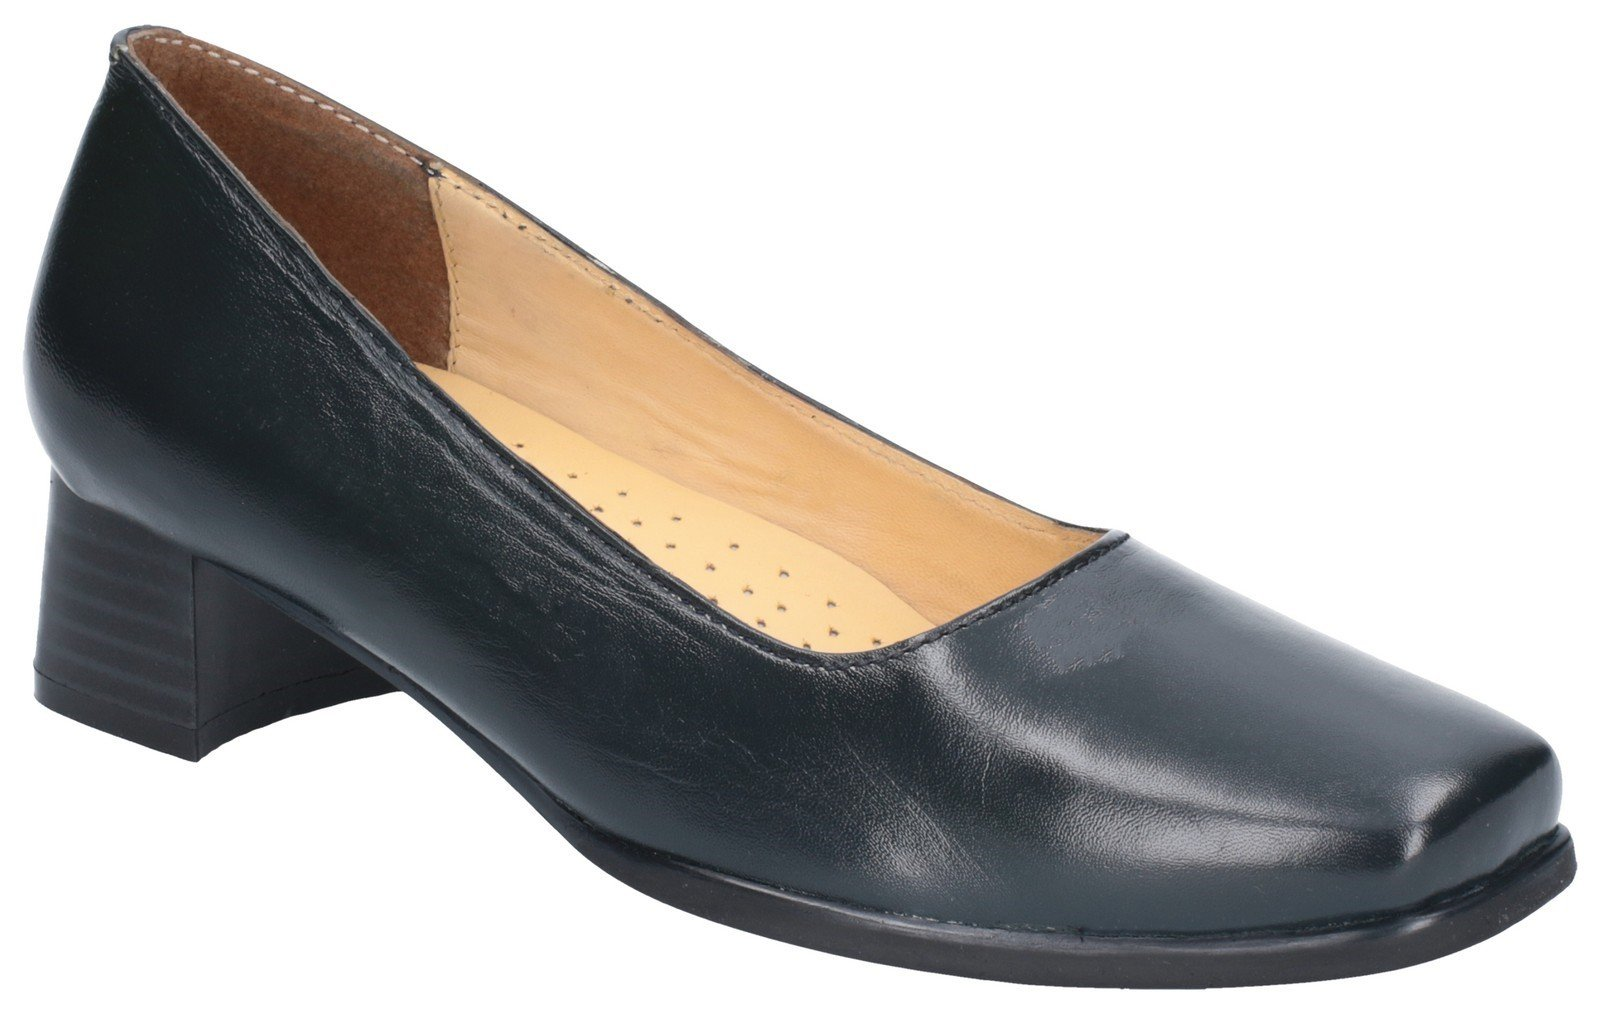 Amblers Women's Walford Ladies Wide Fit Court Shoe Black 15233 - Navy 3